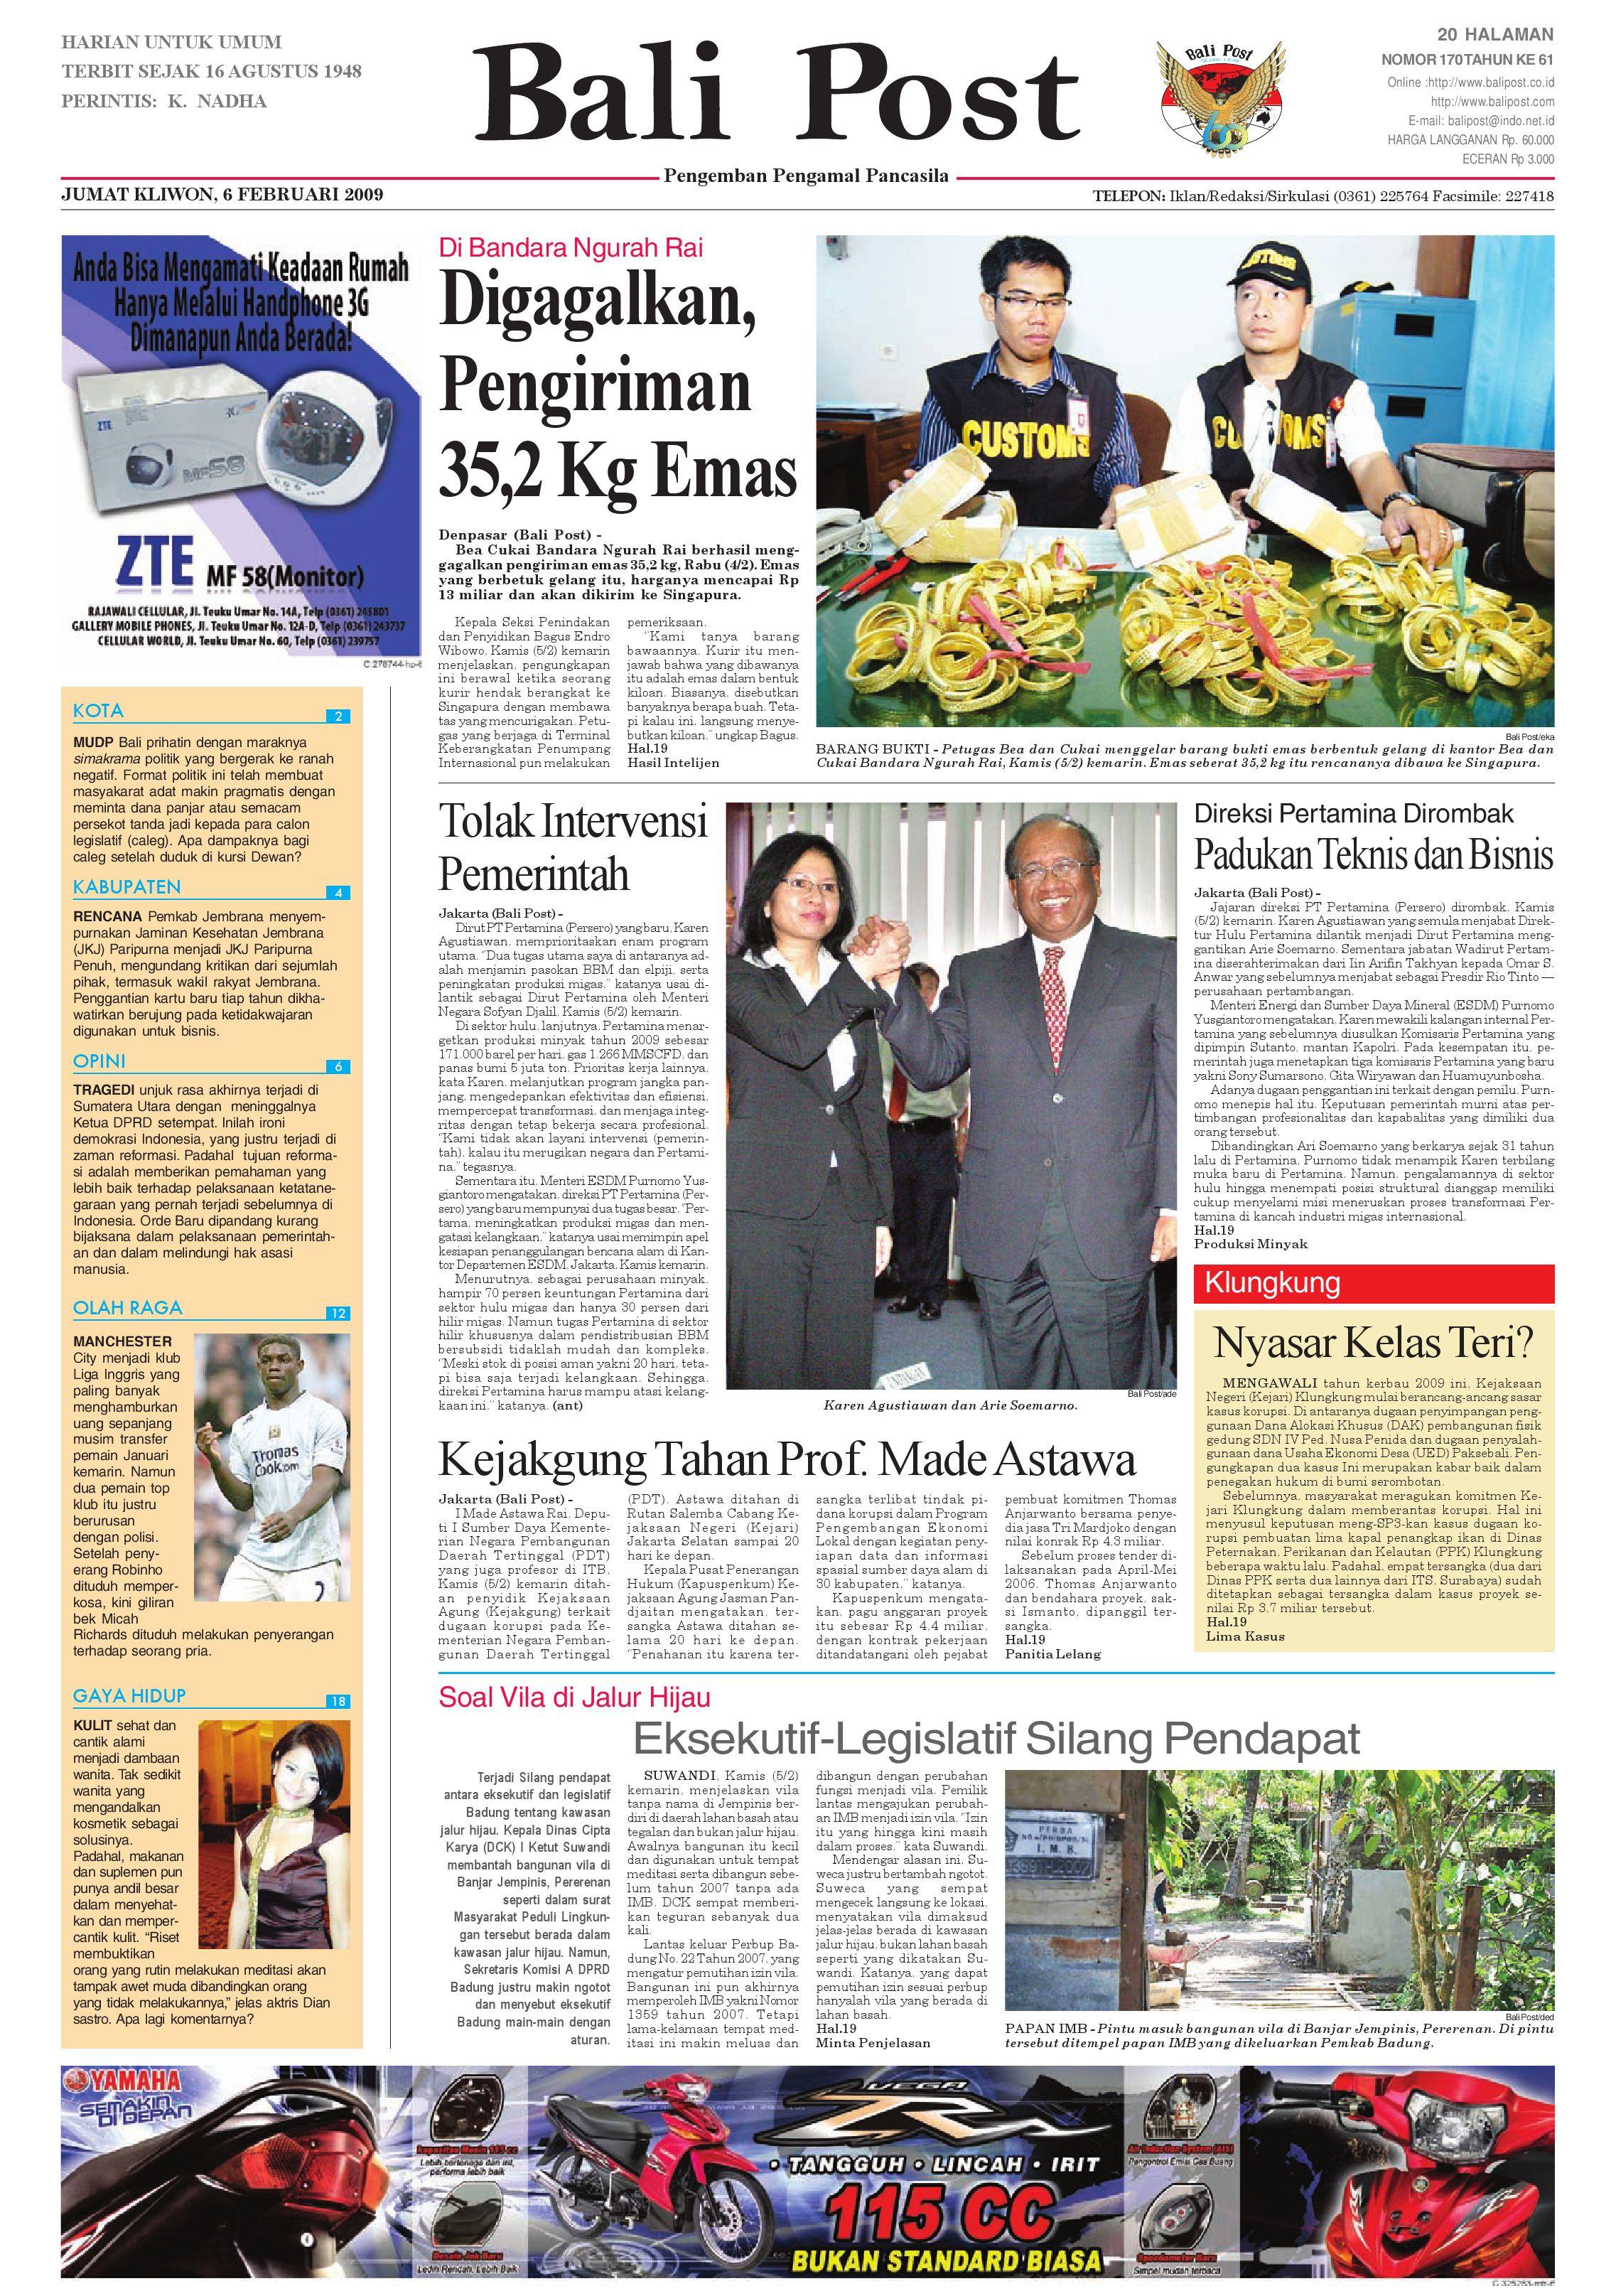 Bali Post Jumat 6 Februari 2009 By E Paper Kmb Issuu Produk Ukm Bumn Philips Essential 18w